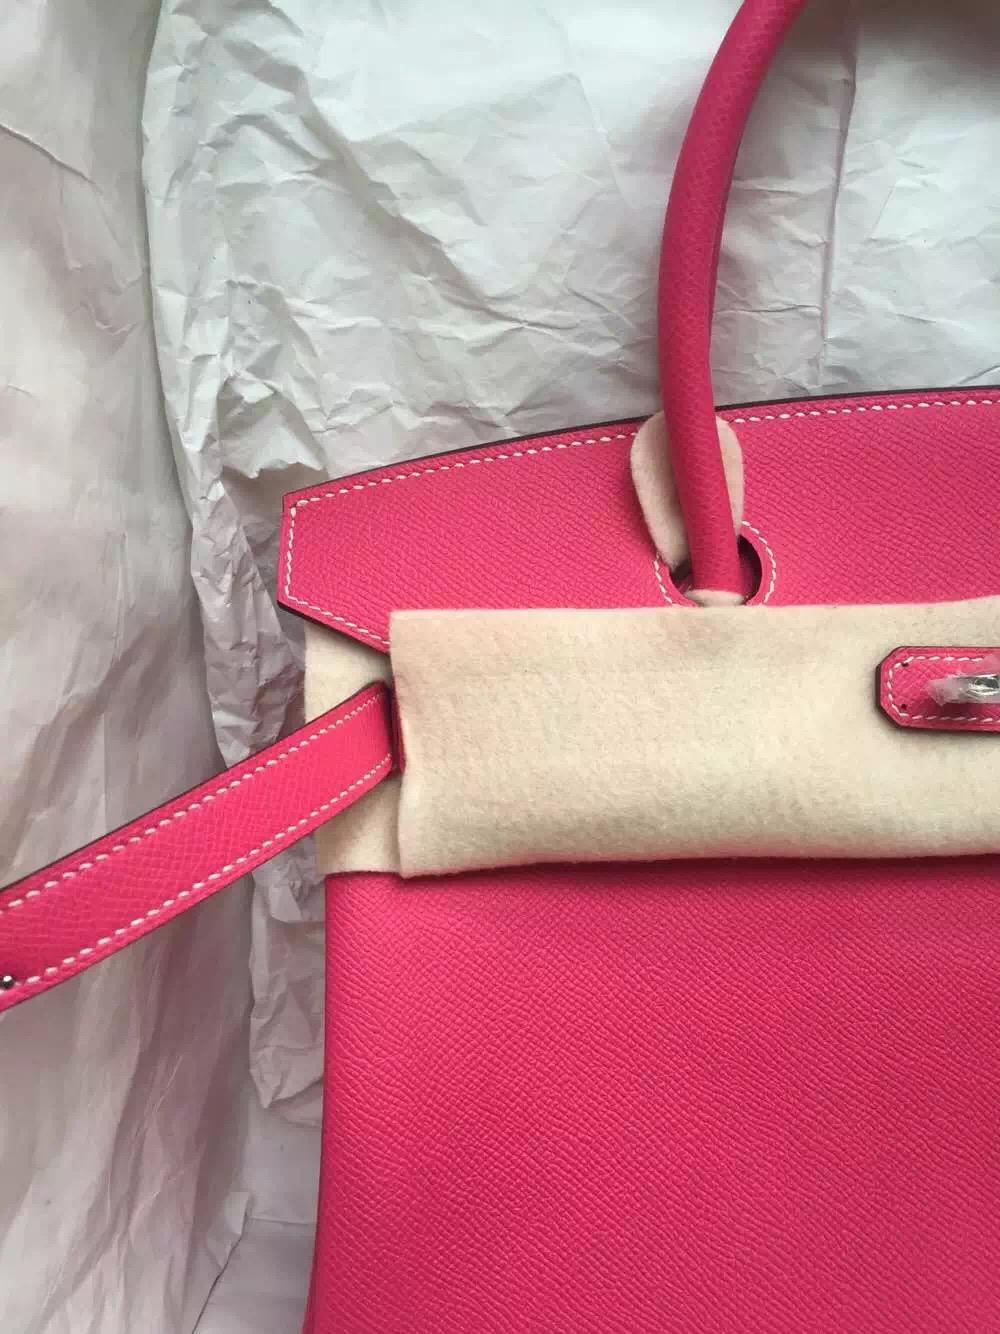 Hand Stitching Hermes Birkin Bag E5 Candy Pink/2T Blue Paradise Epsom Leather 30cm